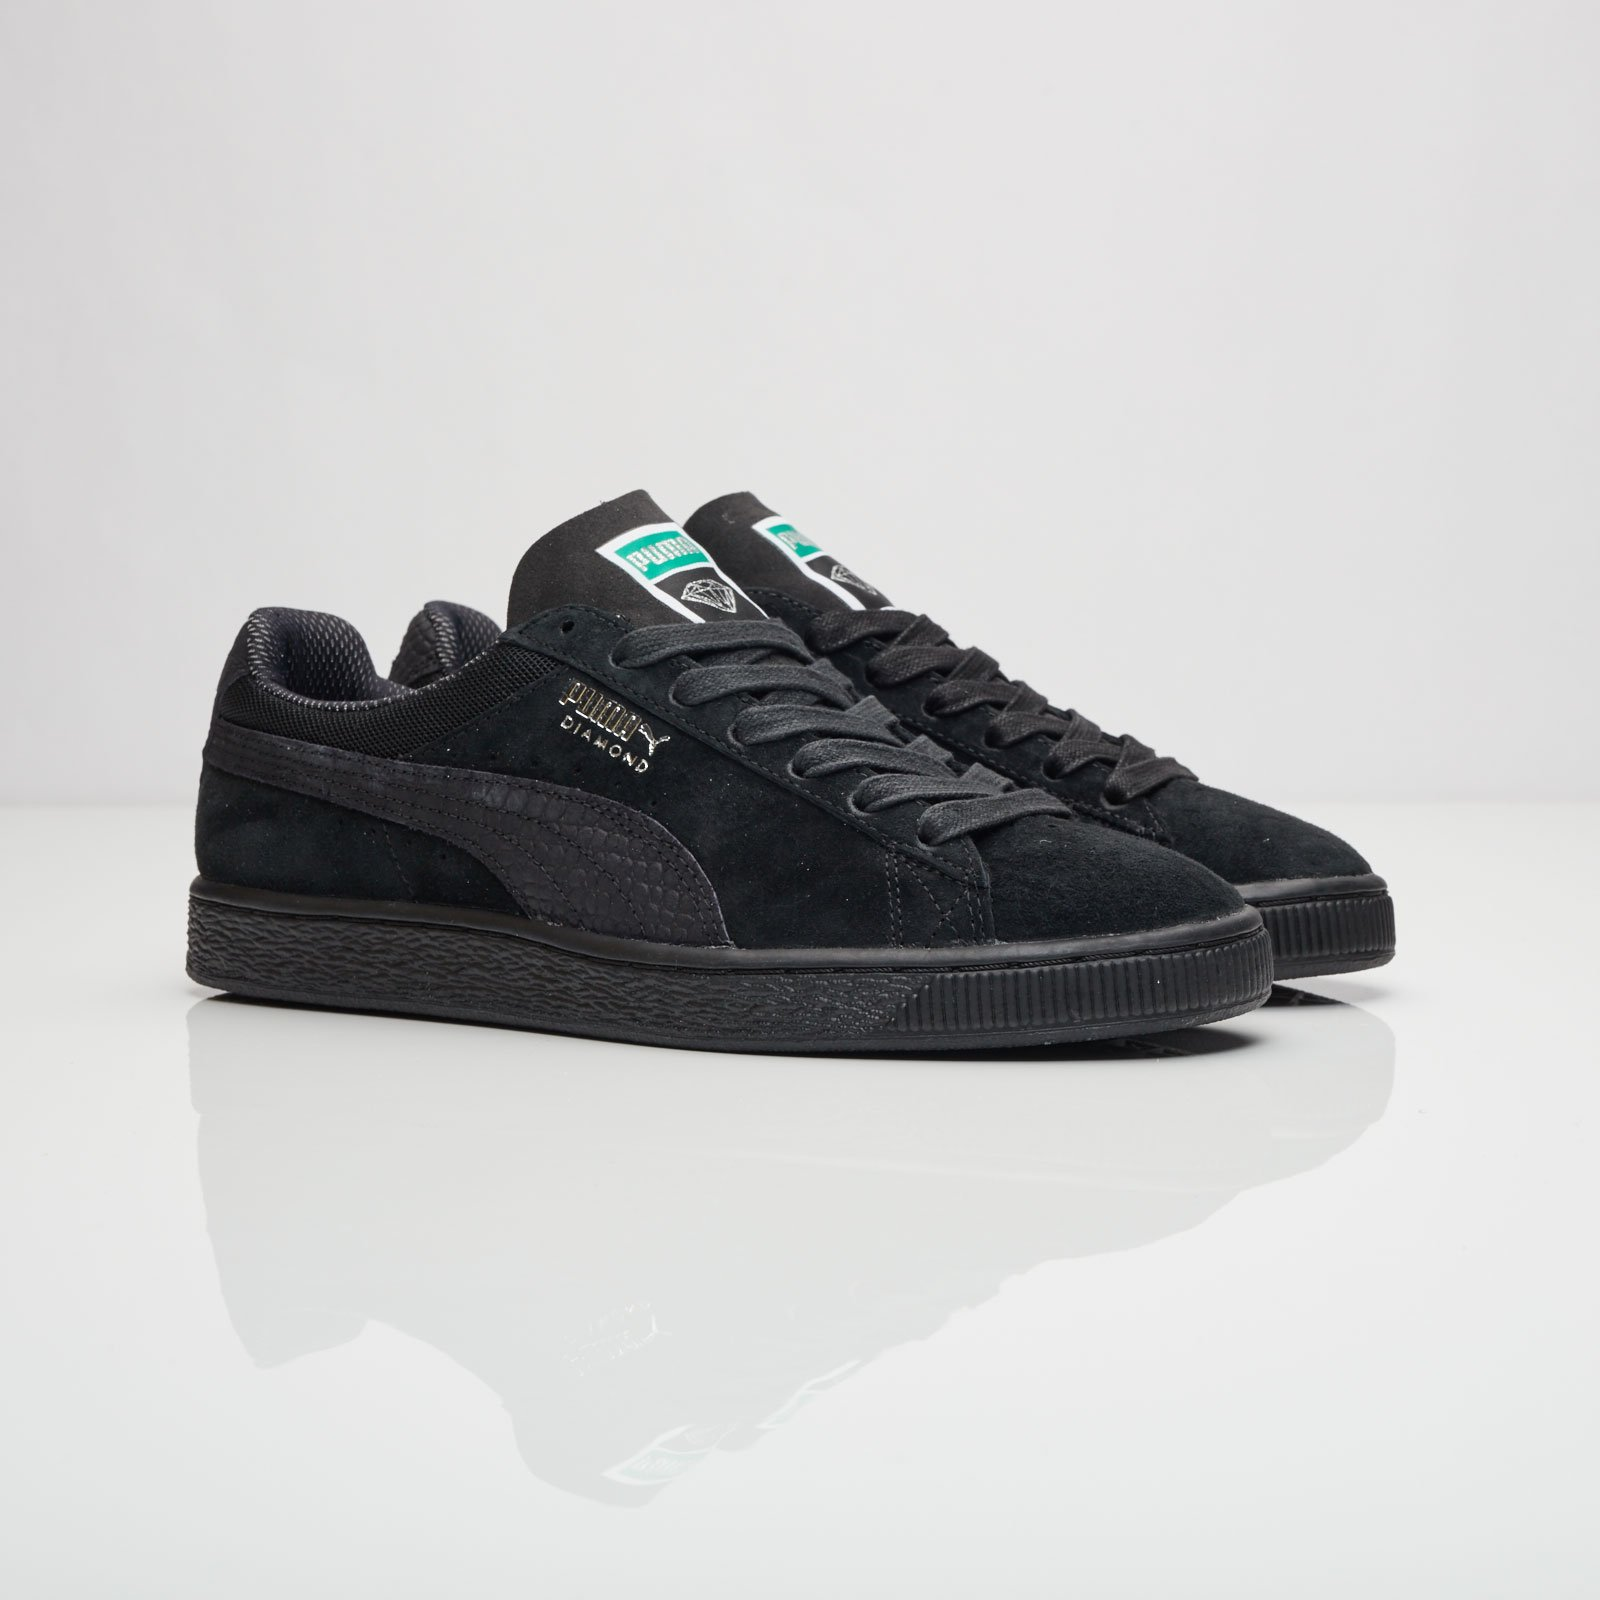 pretty nice b1a7f d92e5 Puma Suede X Diamond Supply - 363001-01 - Sneakersnstuff ...